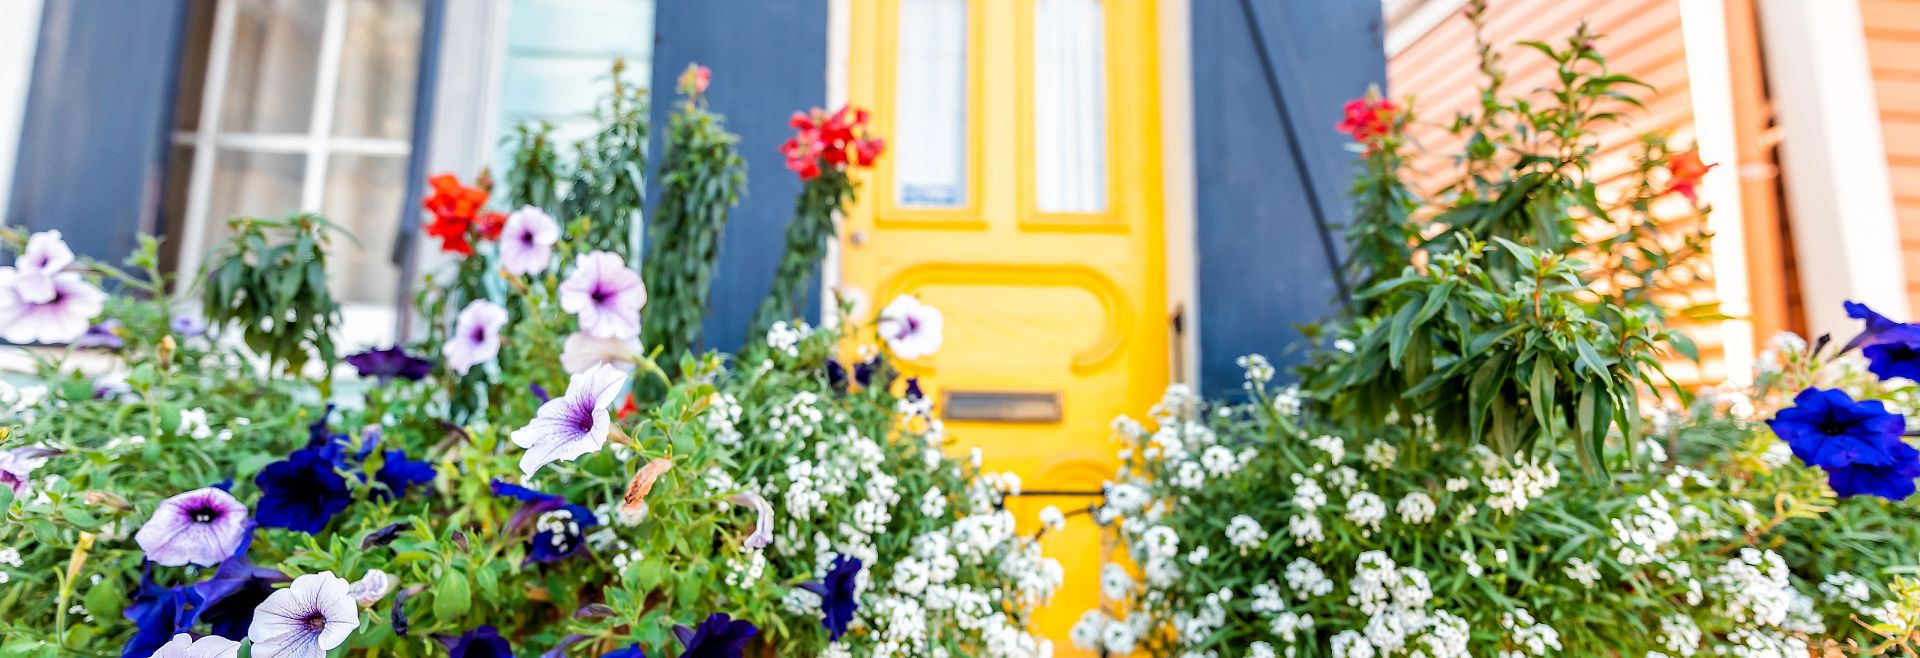 Flower Pots Front Porch Decor Yellow Door Getty Images